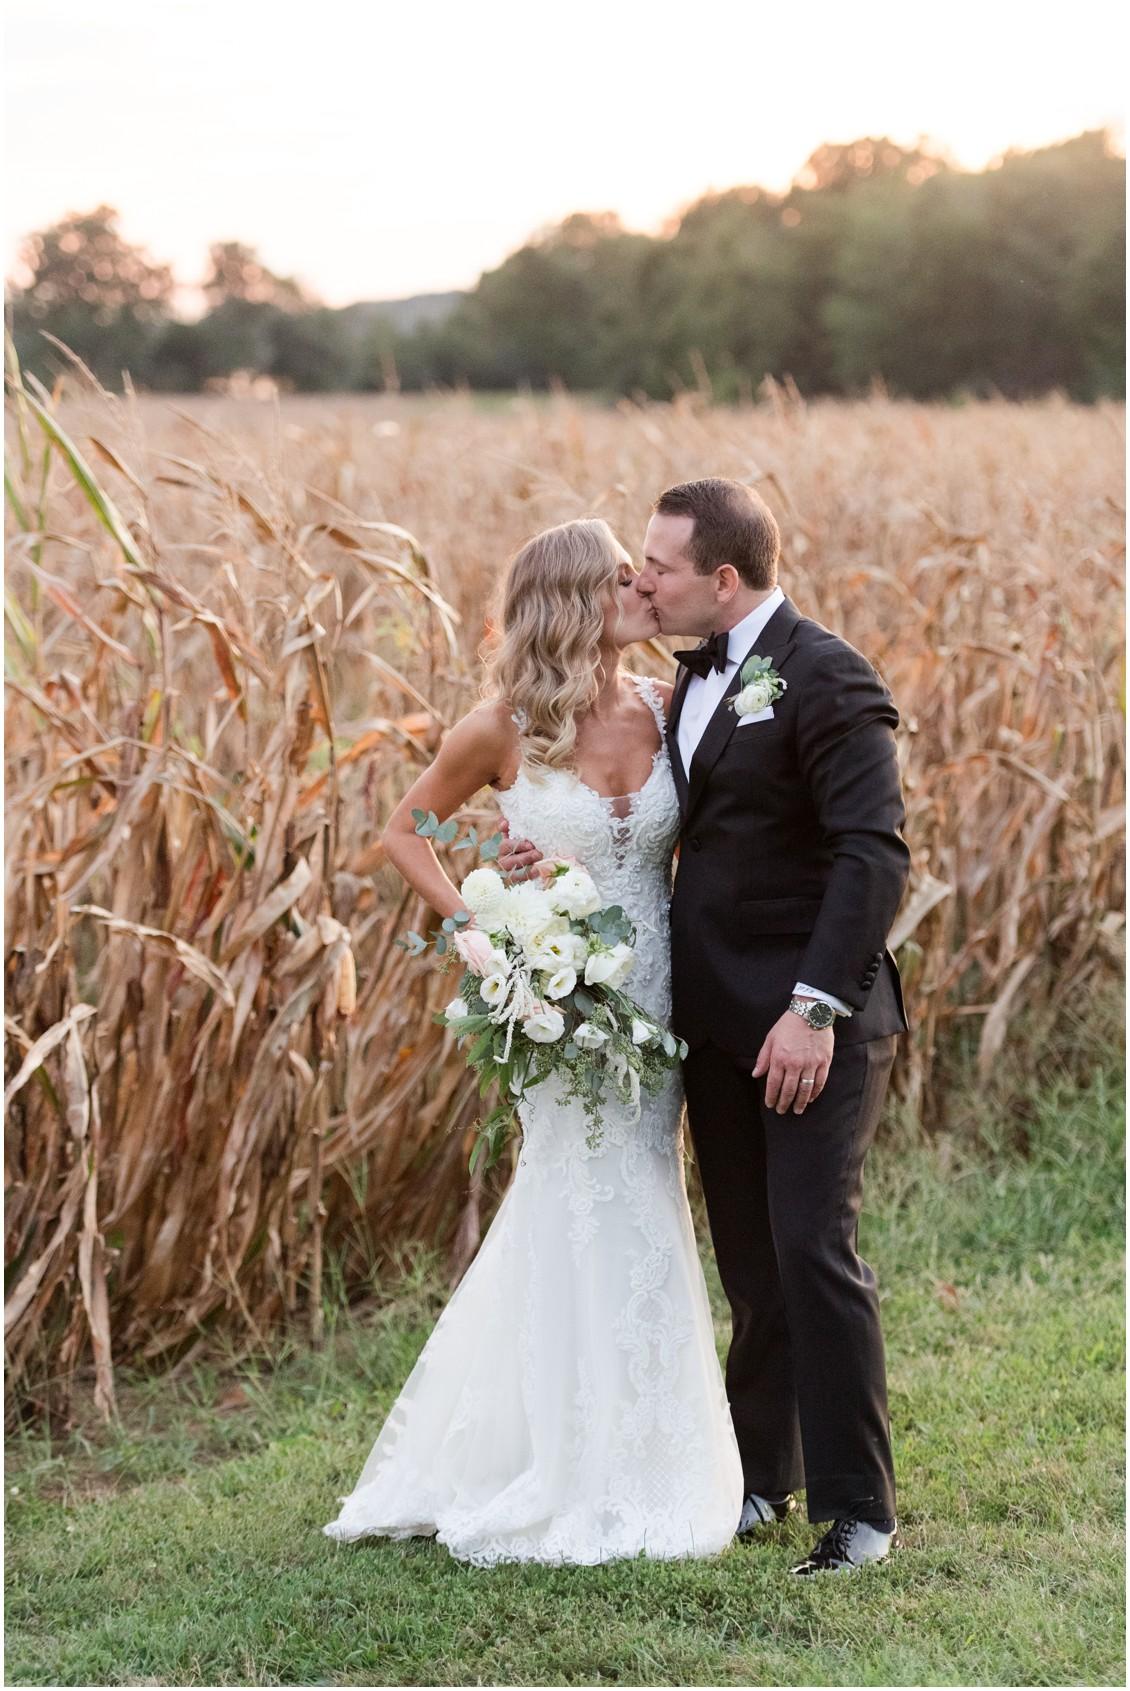 Bride and groom portrait | Brittland Manor | Rob Korb |  My Eastern Shore Wedding